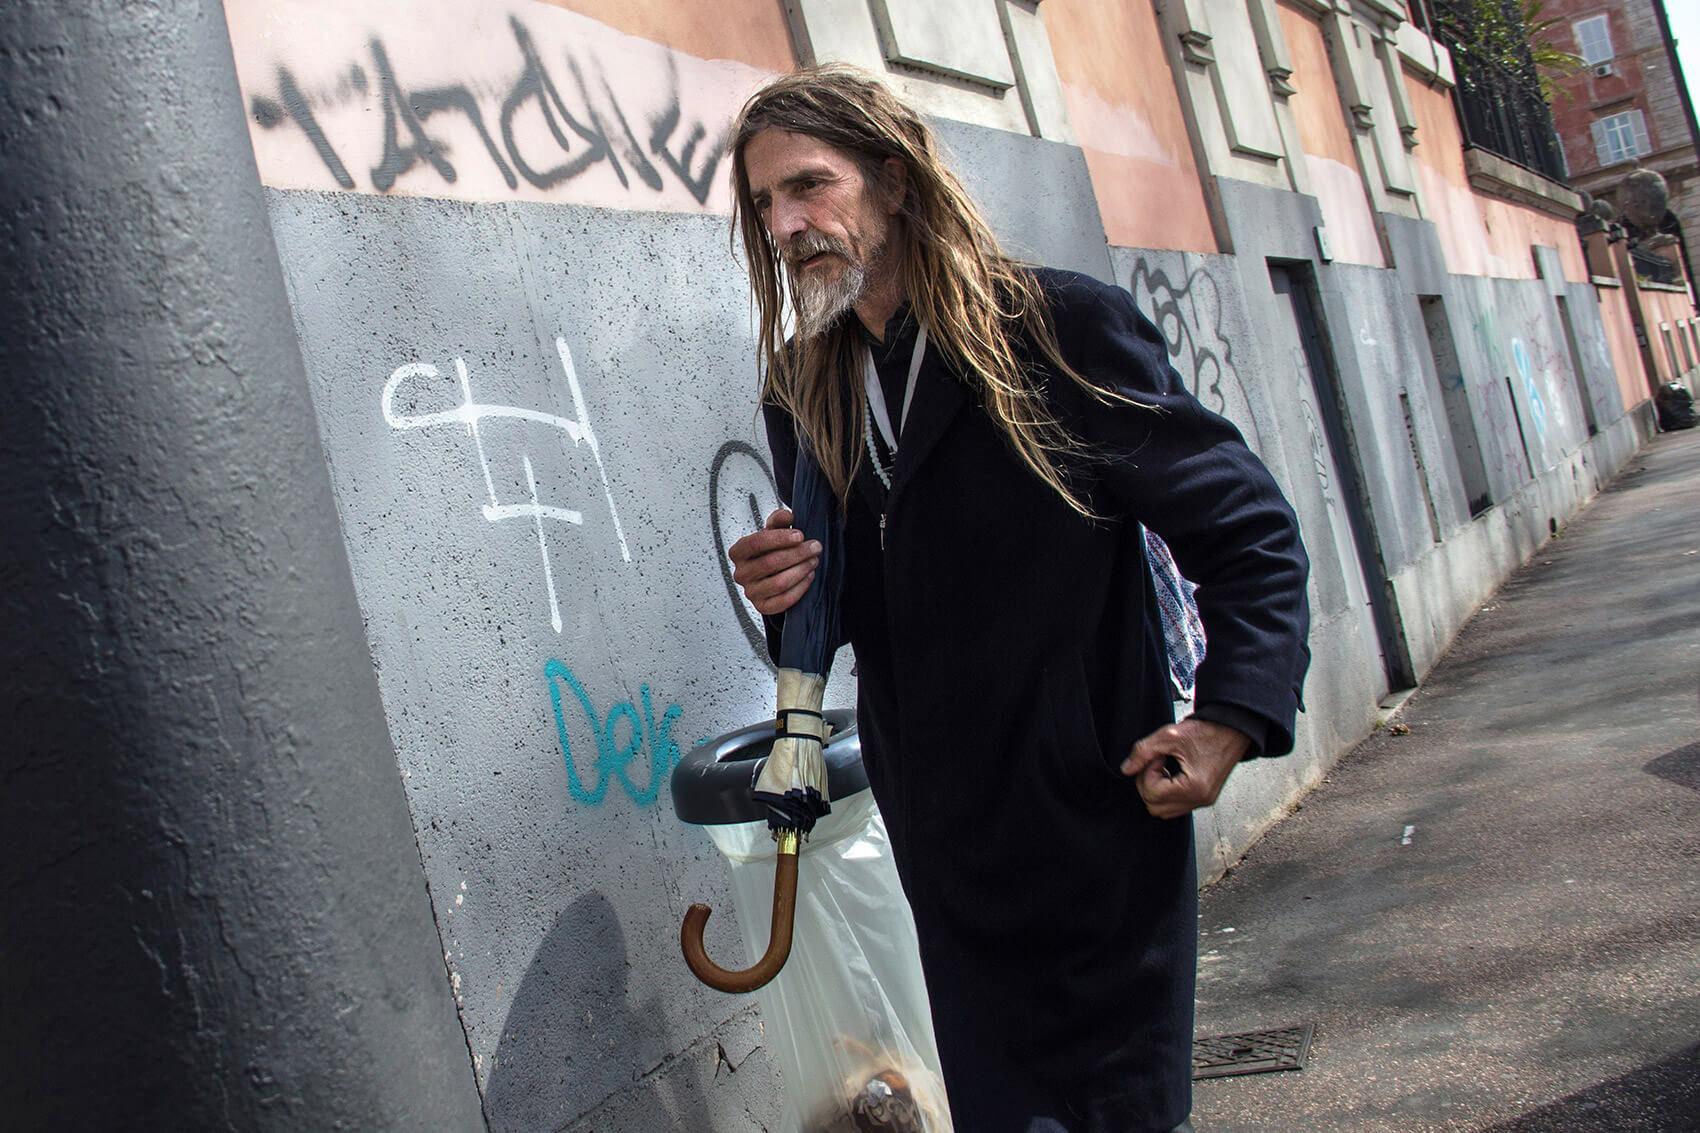 Urban Jesus walking down the street